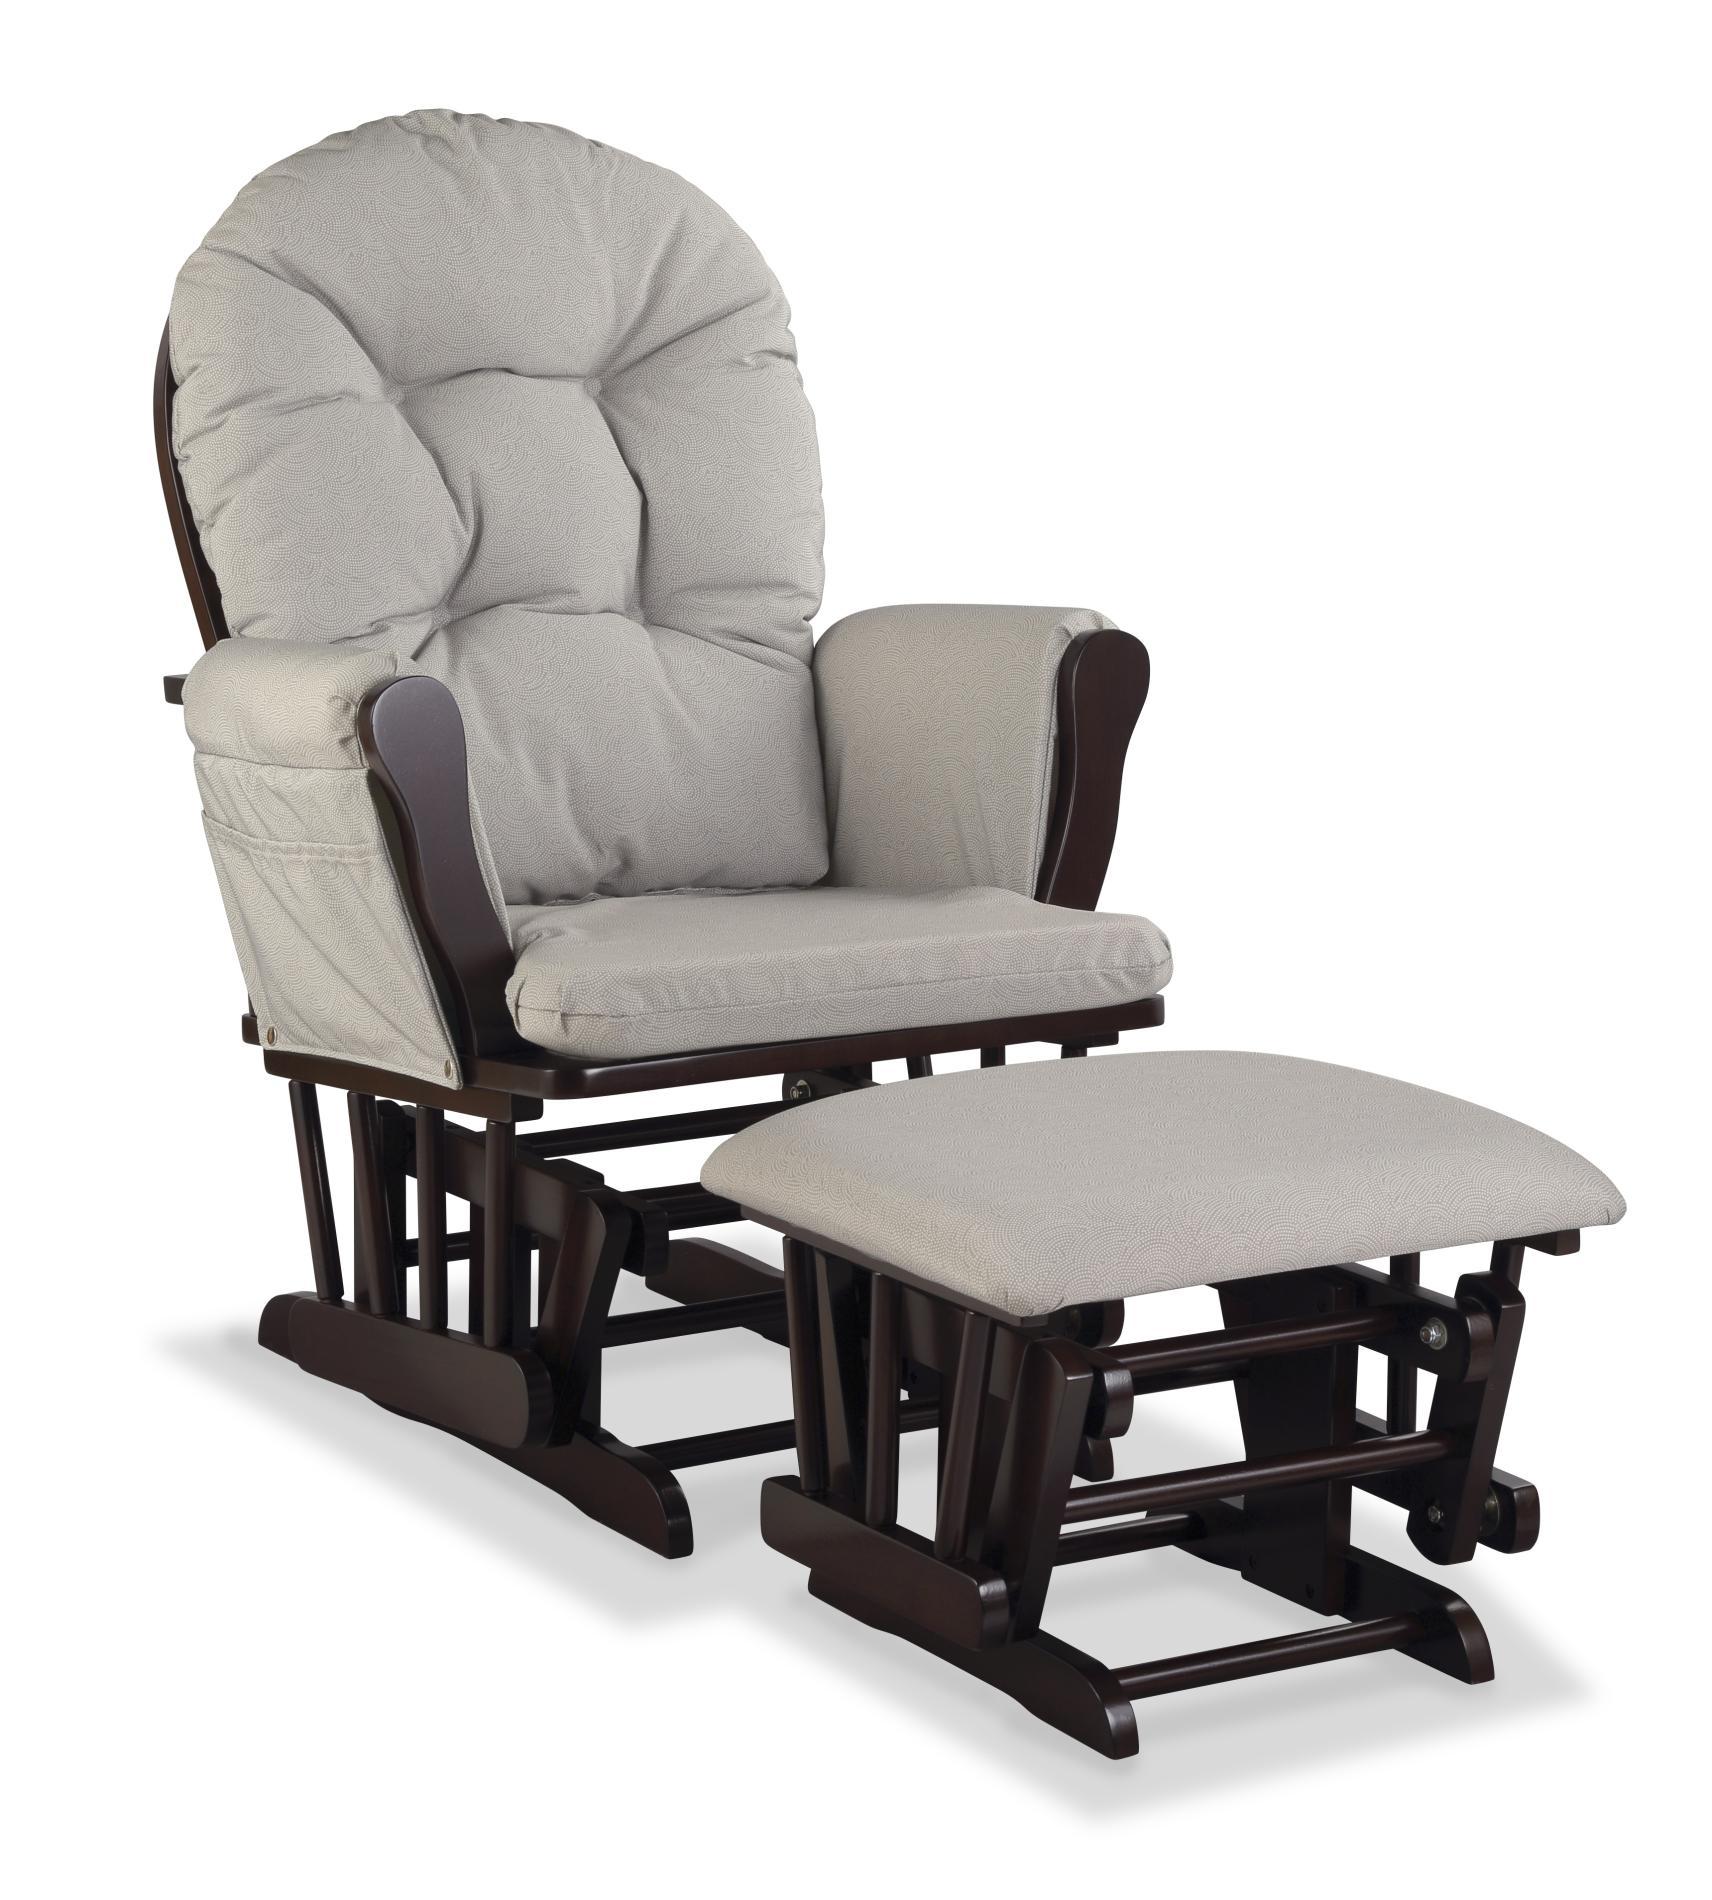 rocking chair for nursery graco nursery glider chair u0026 ottoman GZPKWVV